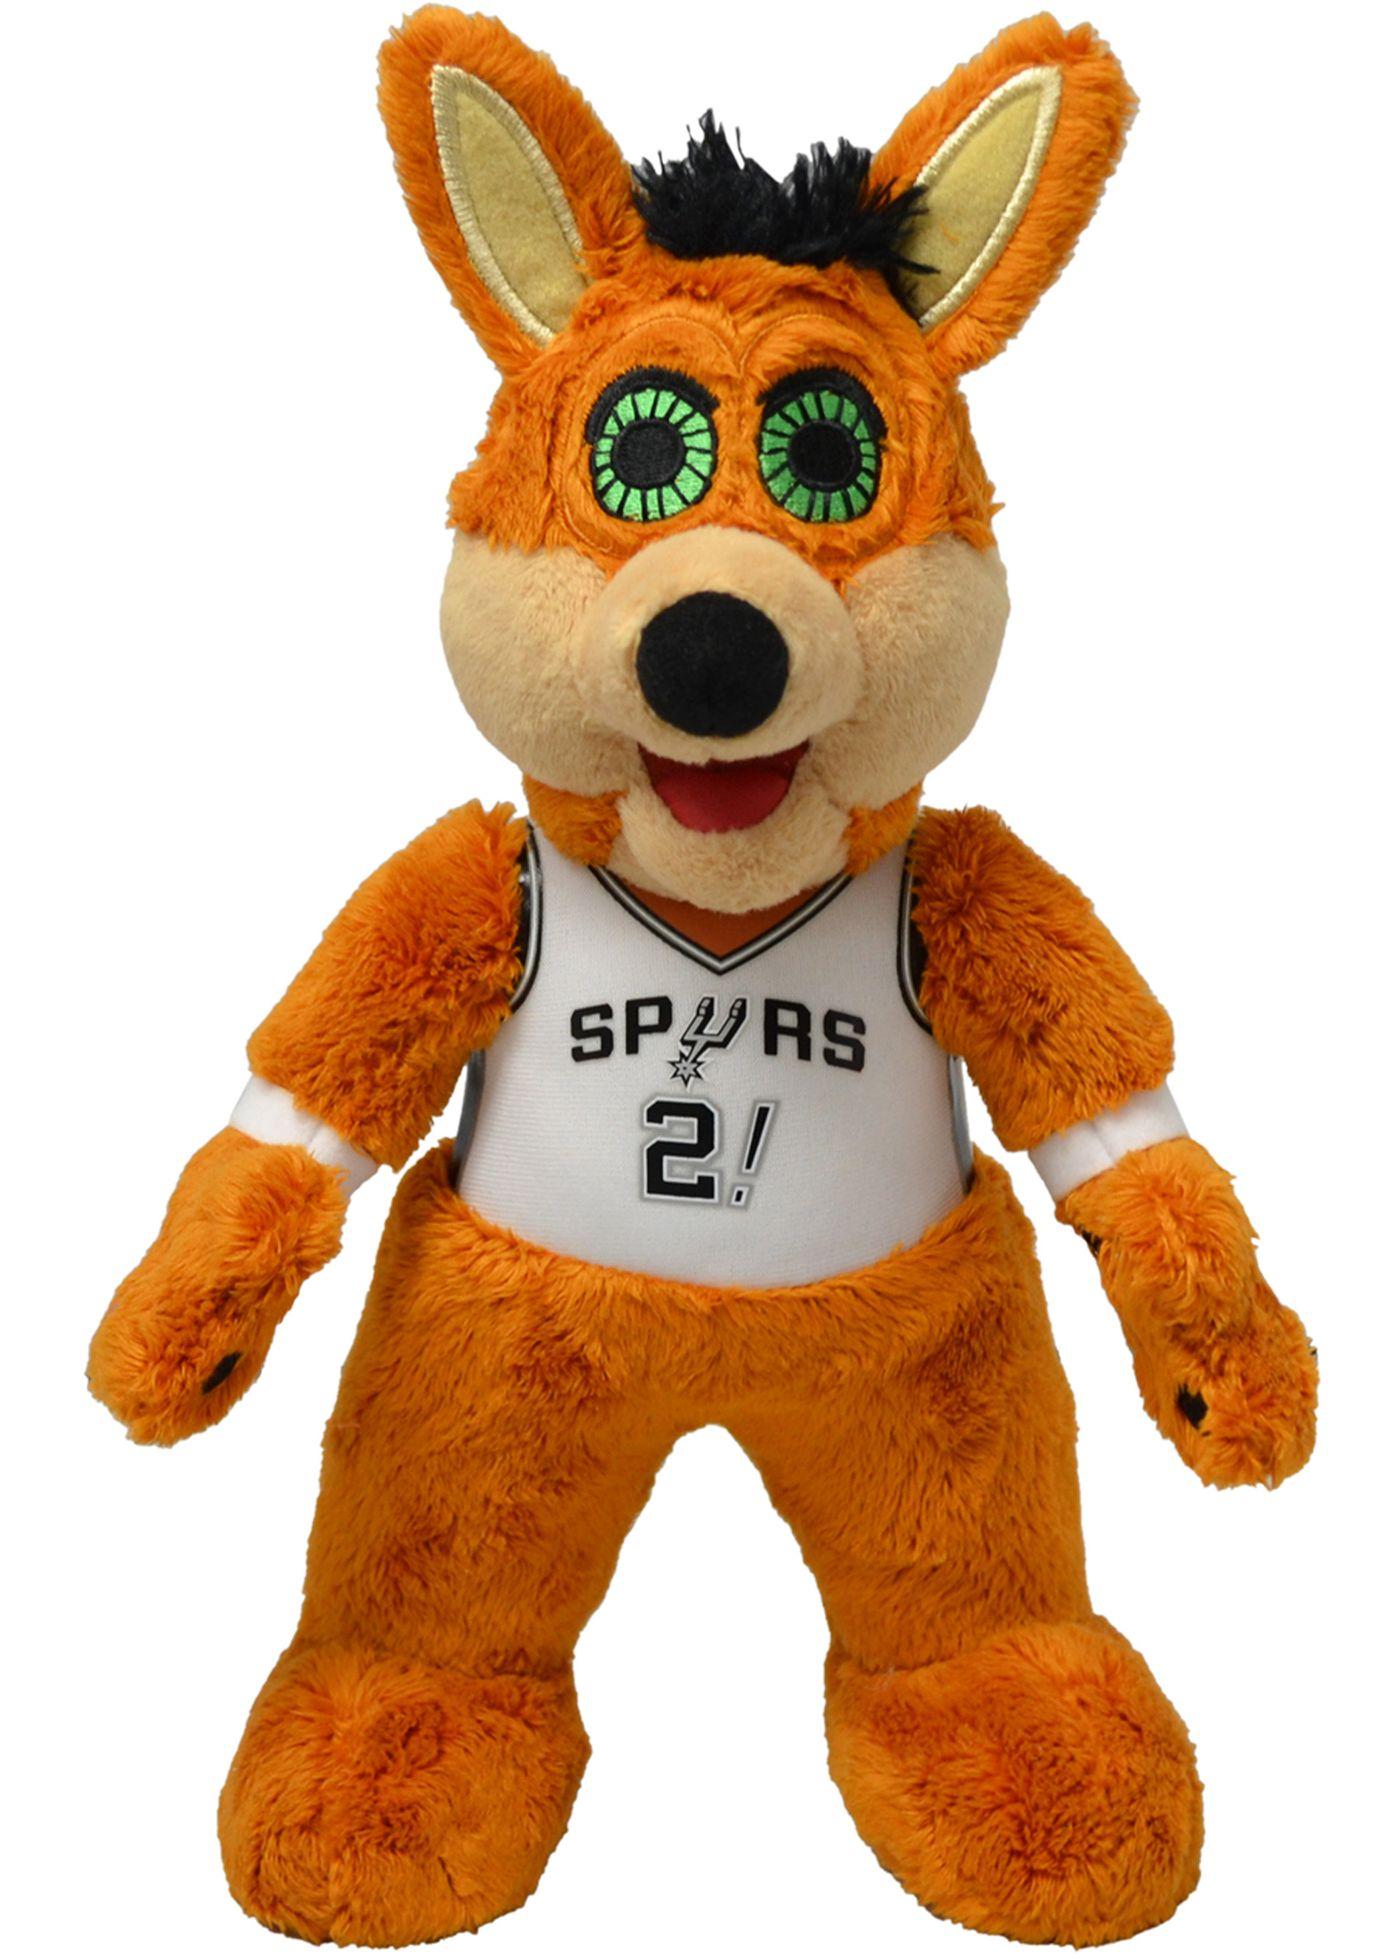 Bleacher Creatures San Antonio Spurs Mascot  Smusher Plush